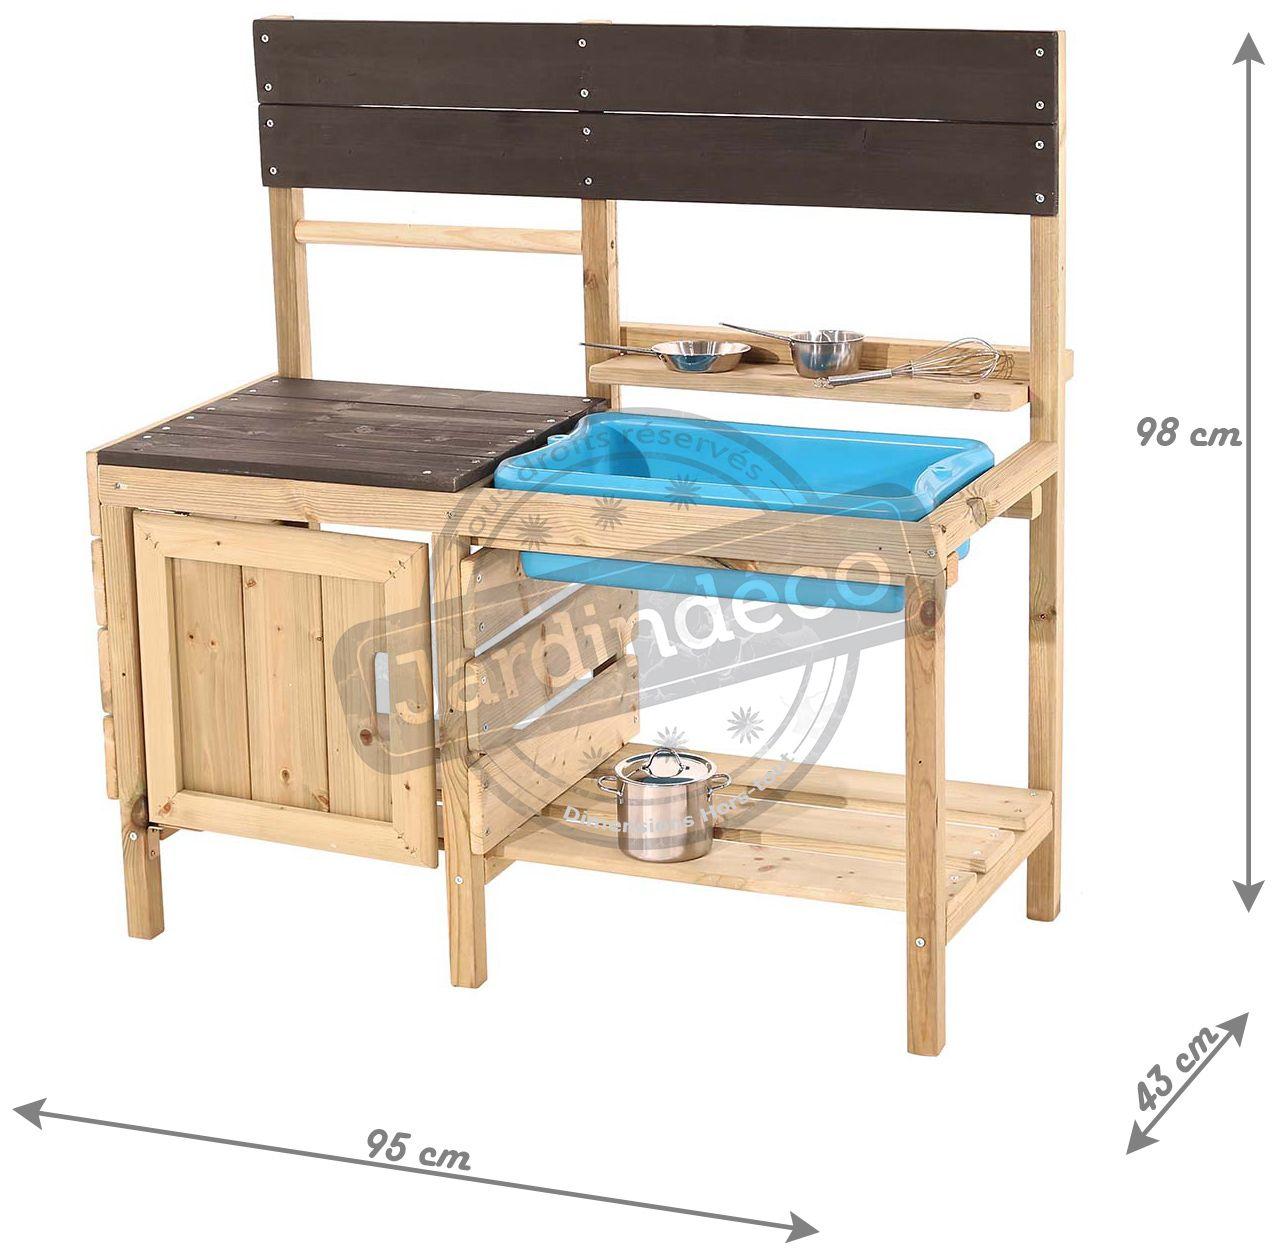 cuisine d 39 t en bois pour enfants muddy maker. Black Bedroom Furniture Sets. Home Design Ideas